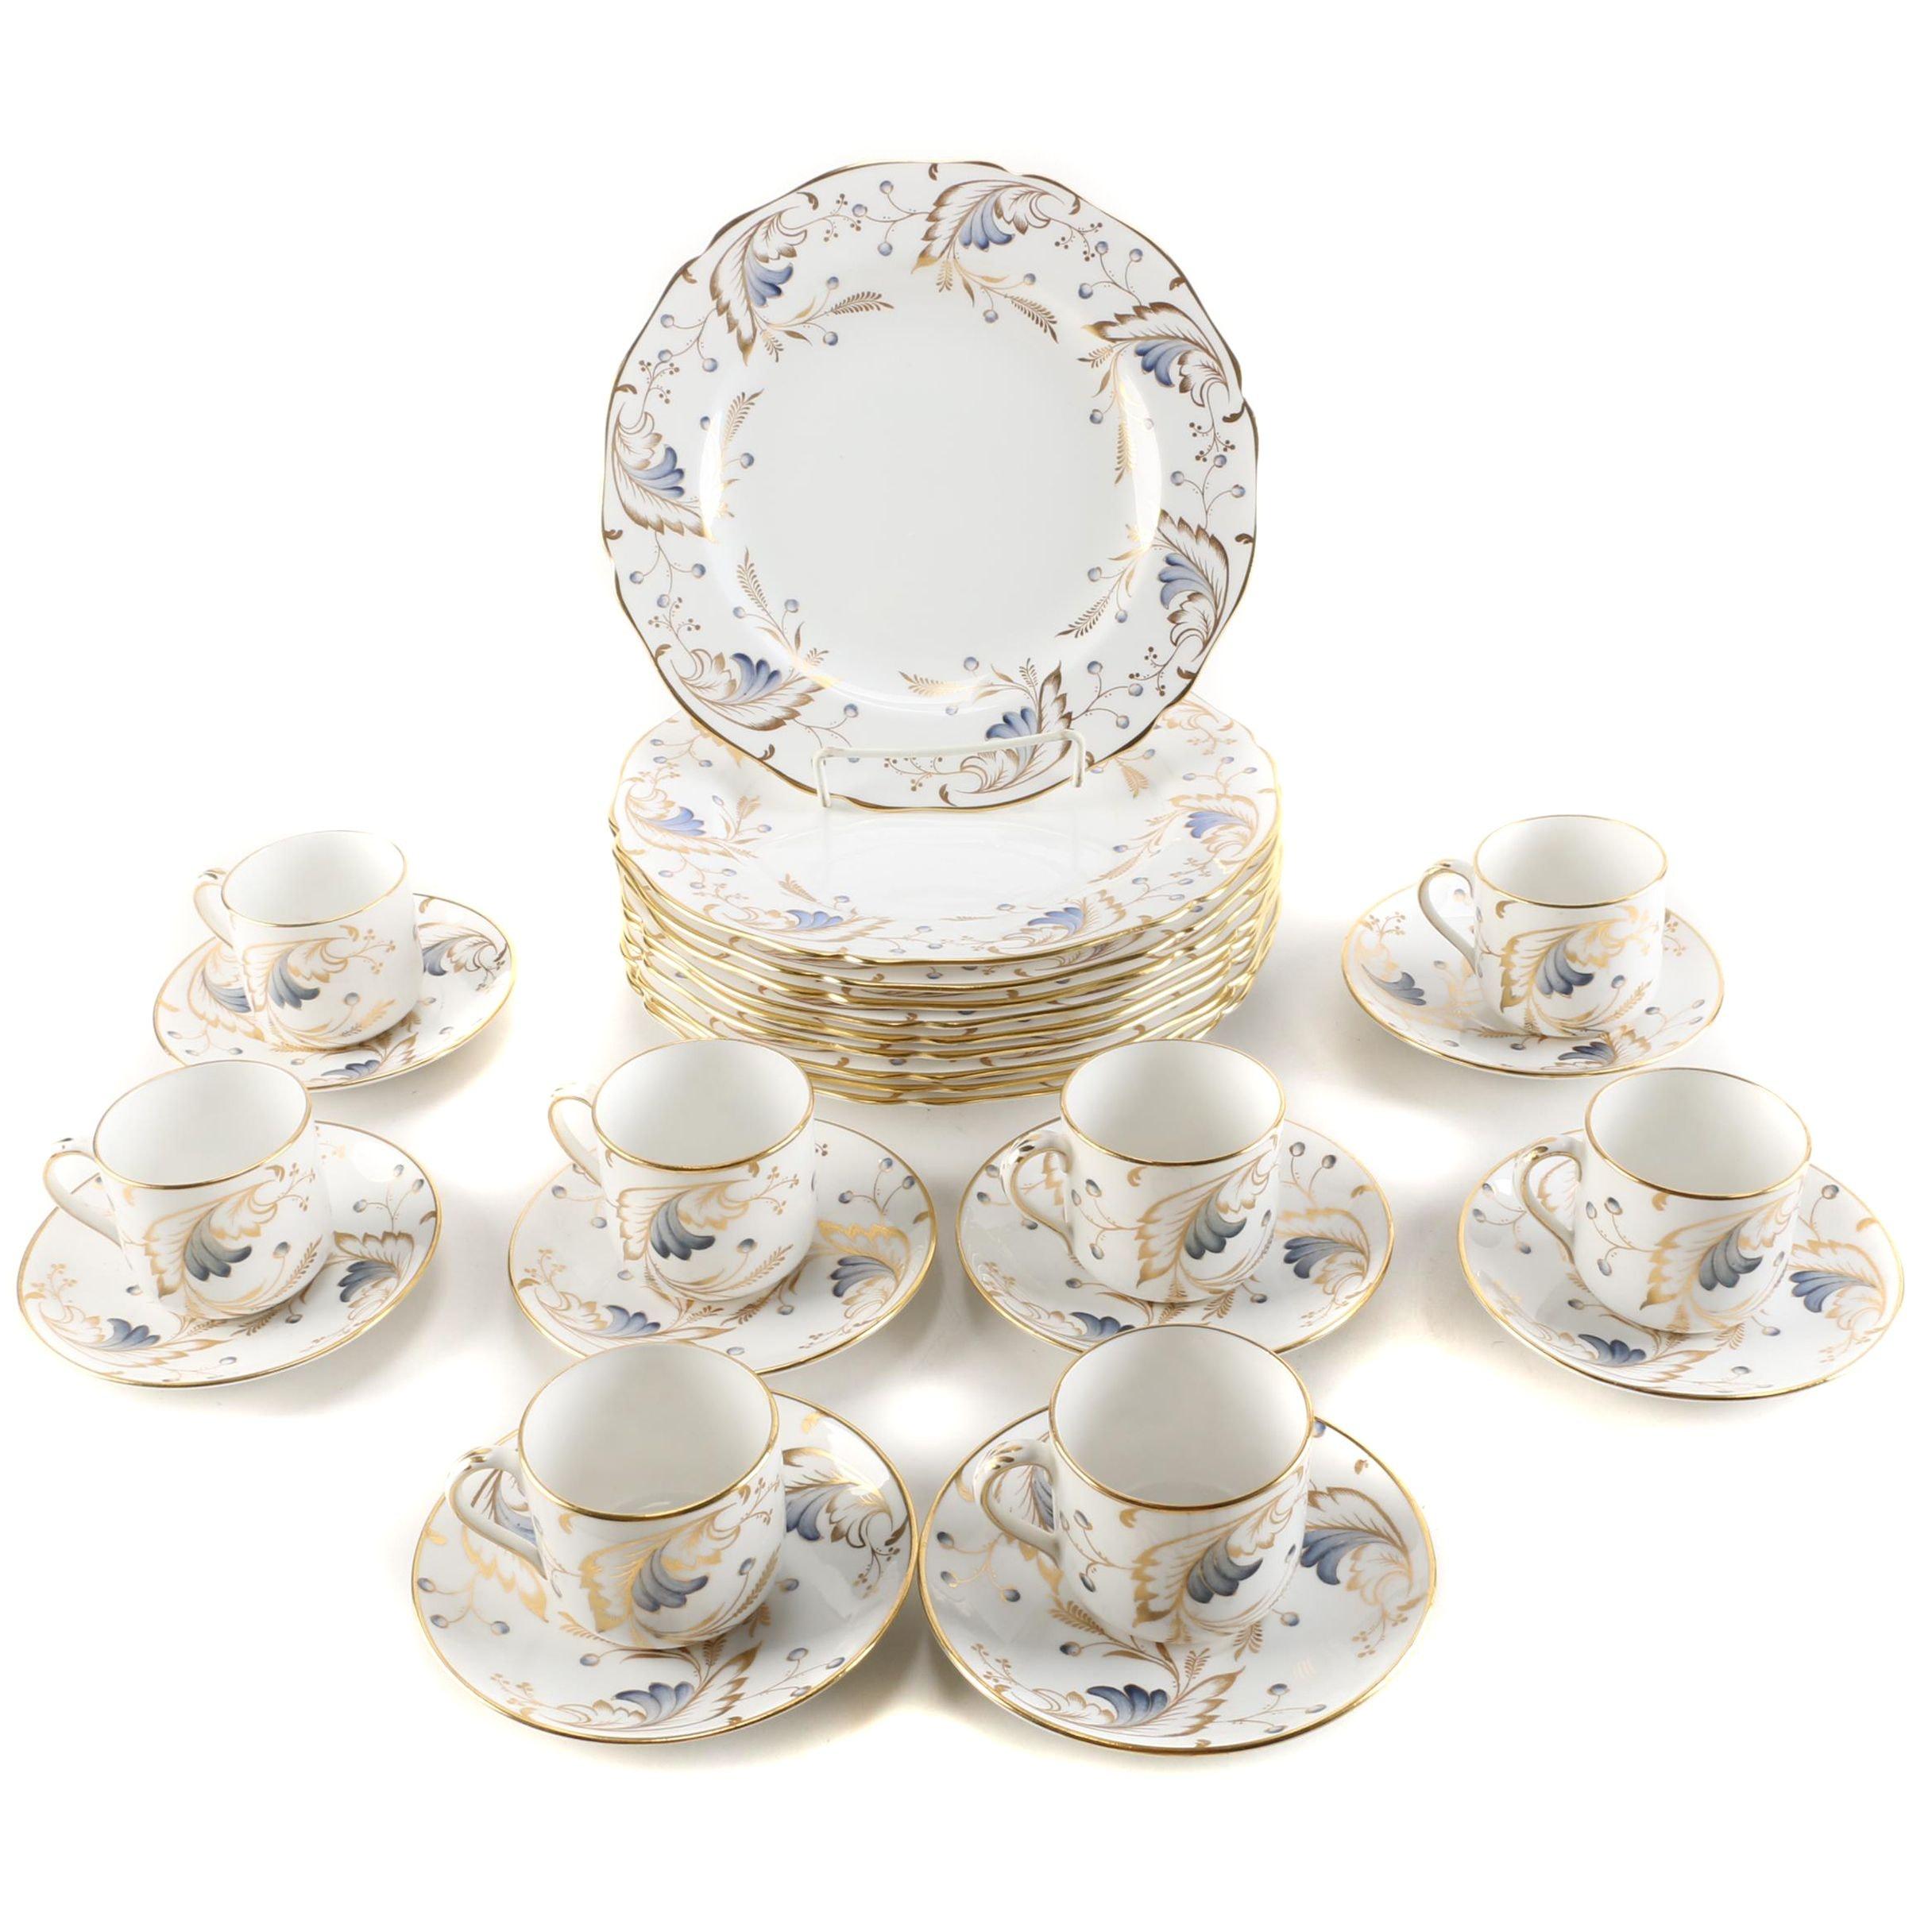 "Grosvenor China ""Royce"" Dinnerware For Tiffany & Co."